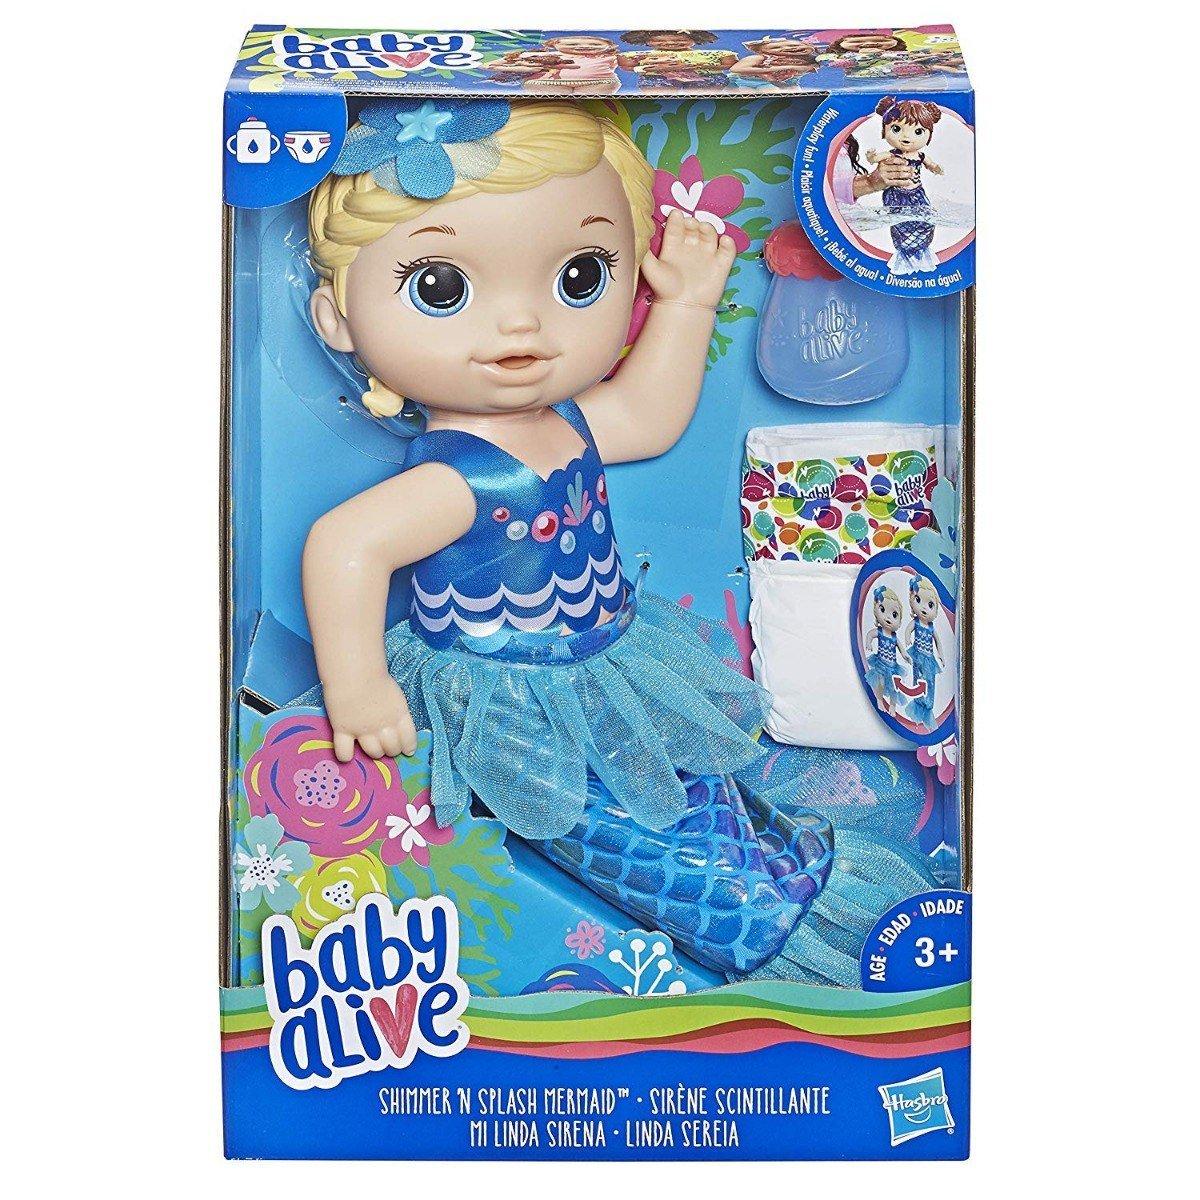 Boneca Baby Alive Linda Sereia Loira - Hasbro E3693